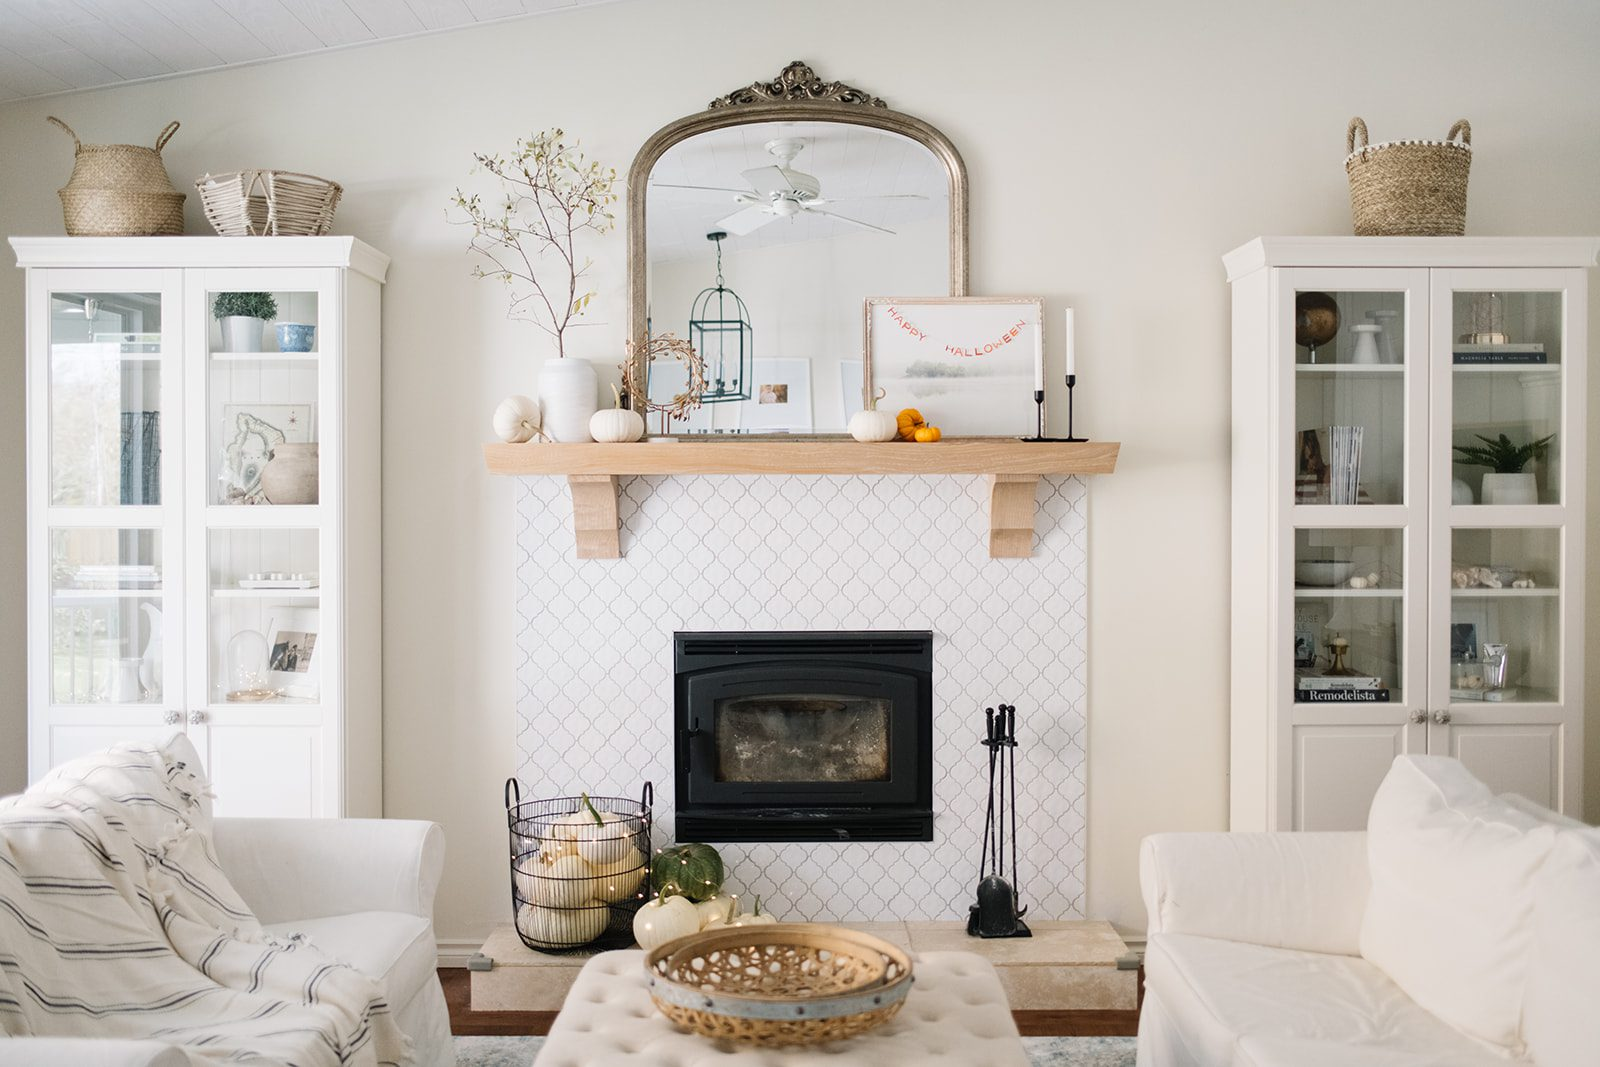 Subtle Halloween fireplace